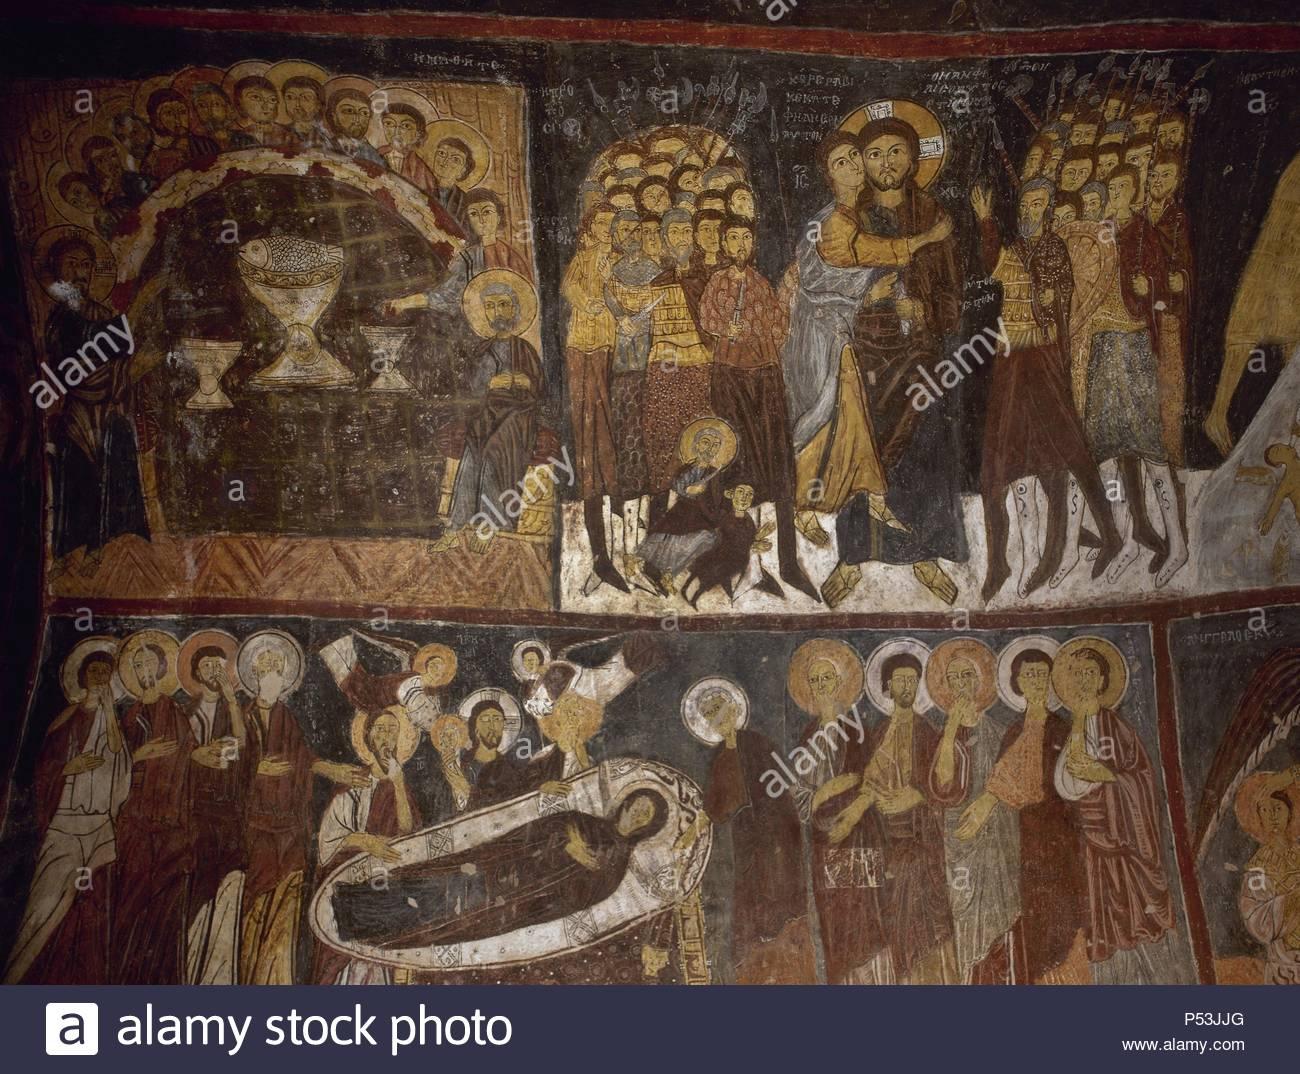 Arte Mural Bizantino